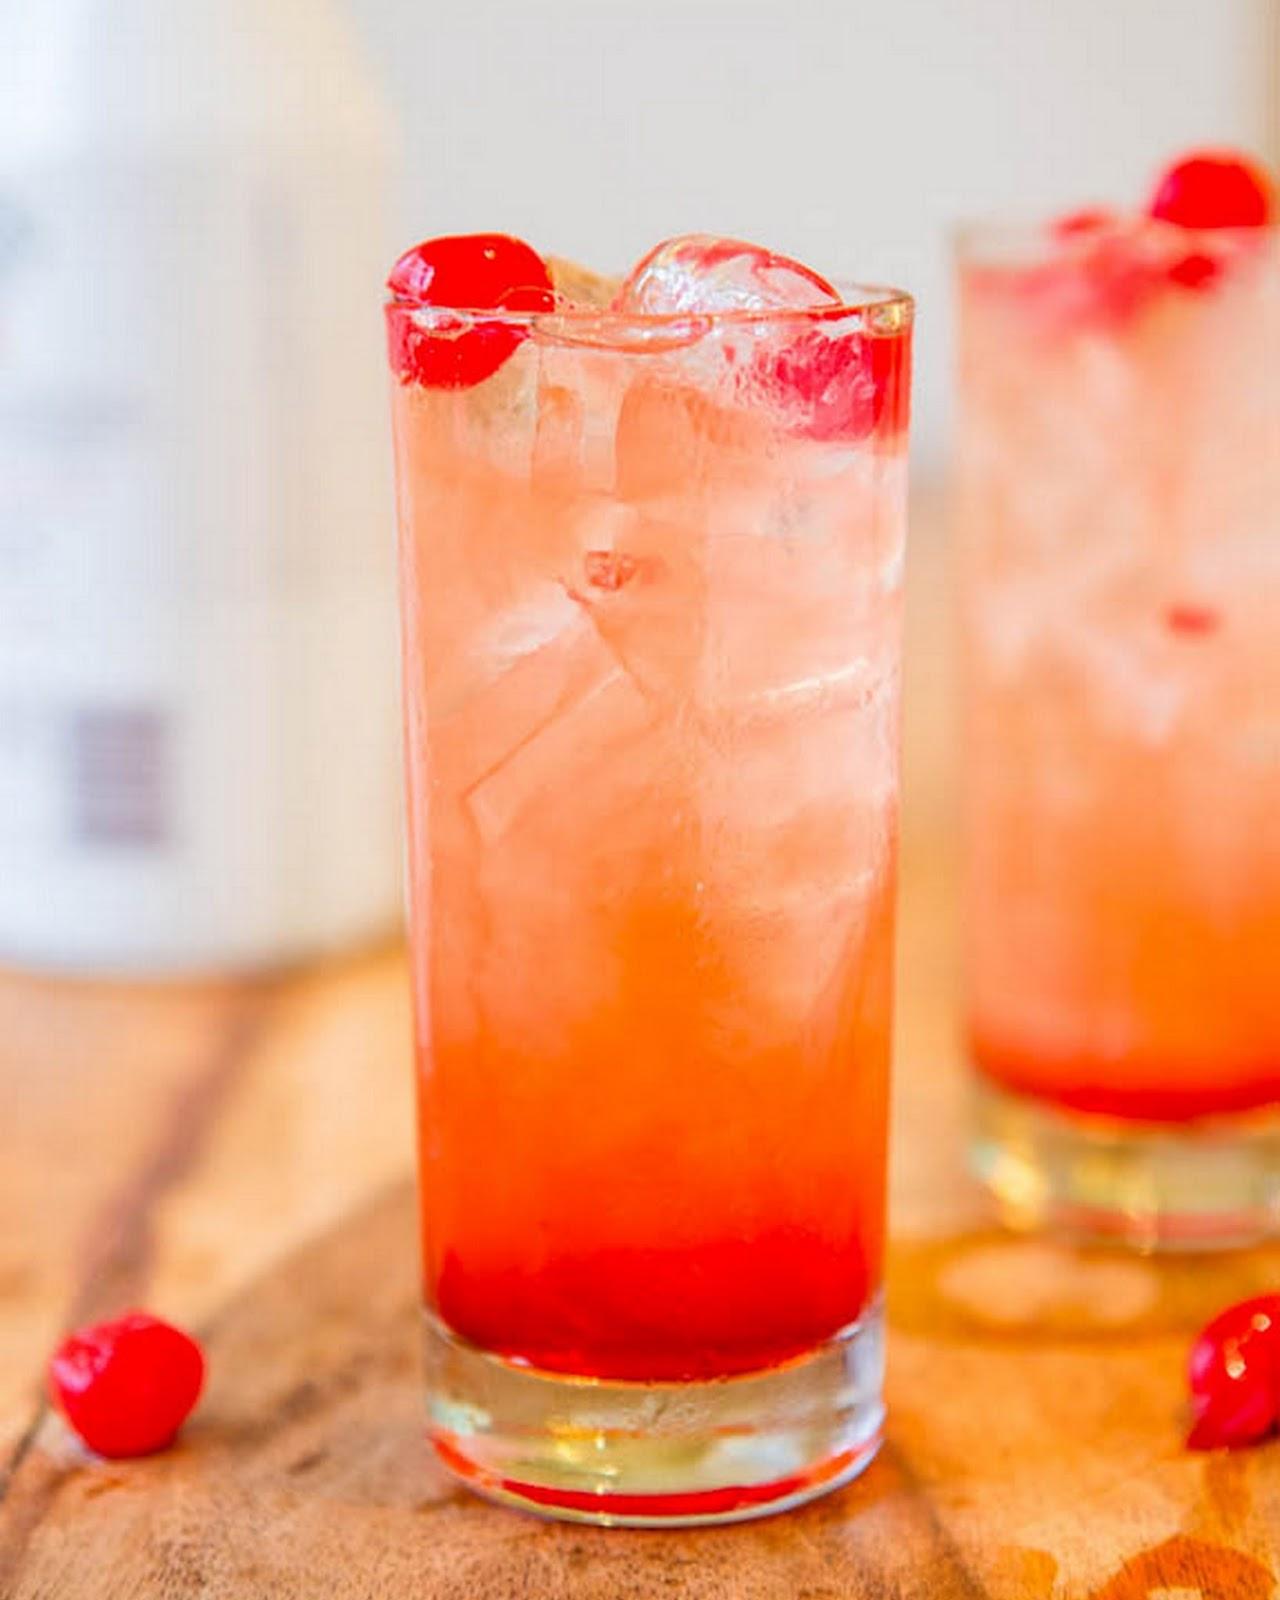 Malibu Rum And Pineapple Juice Drink Name